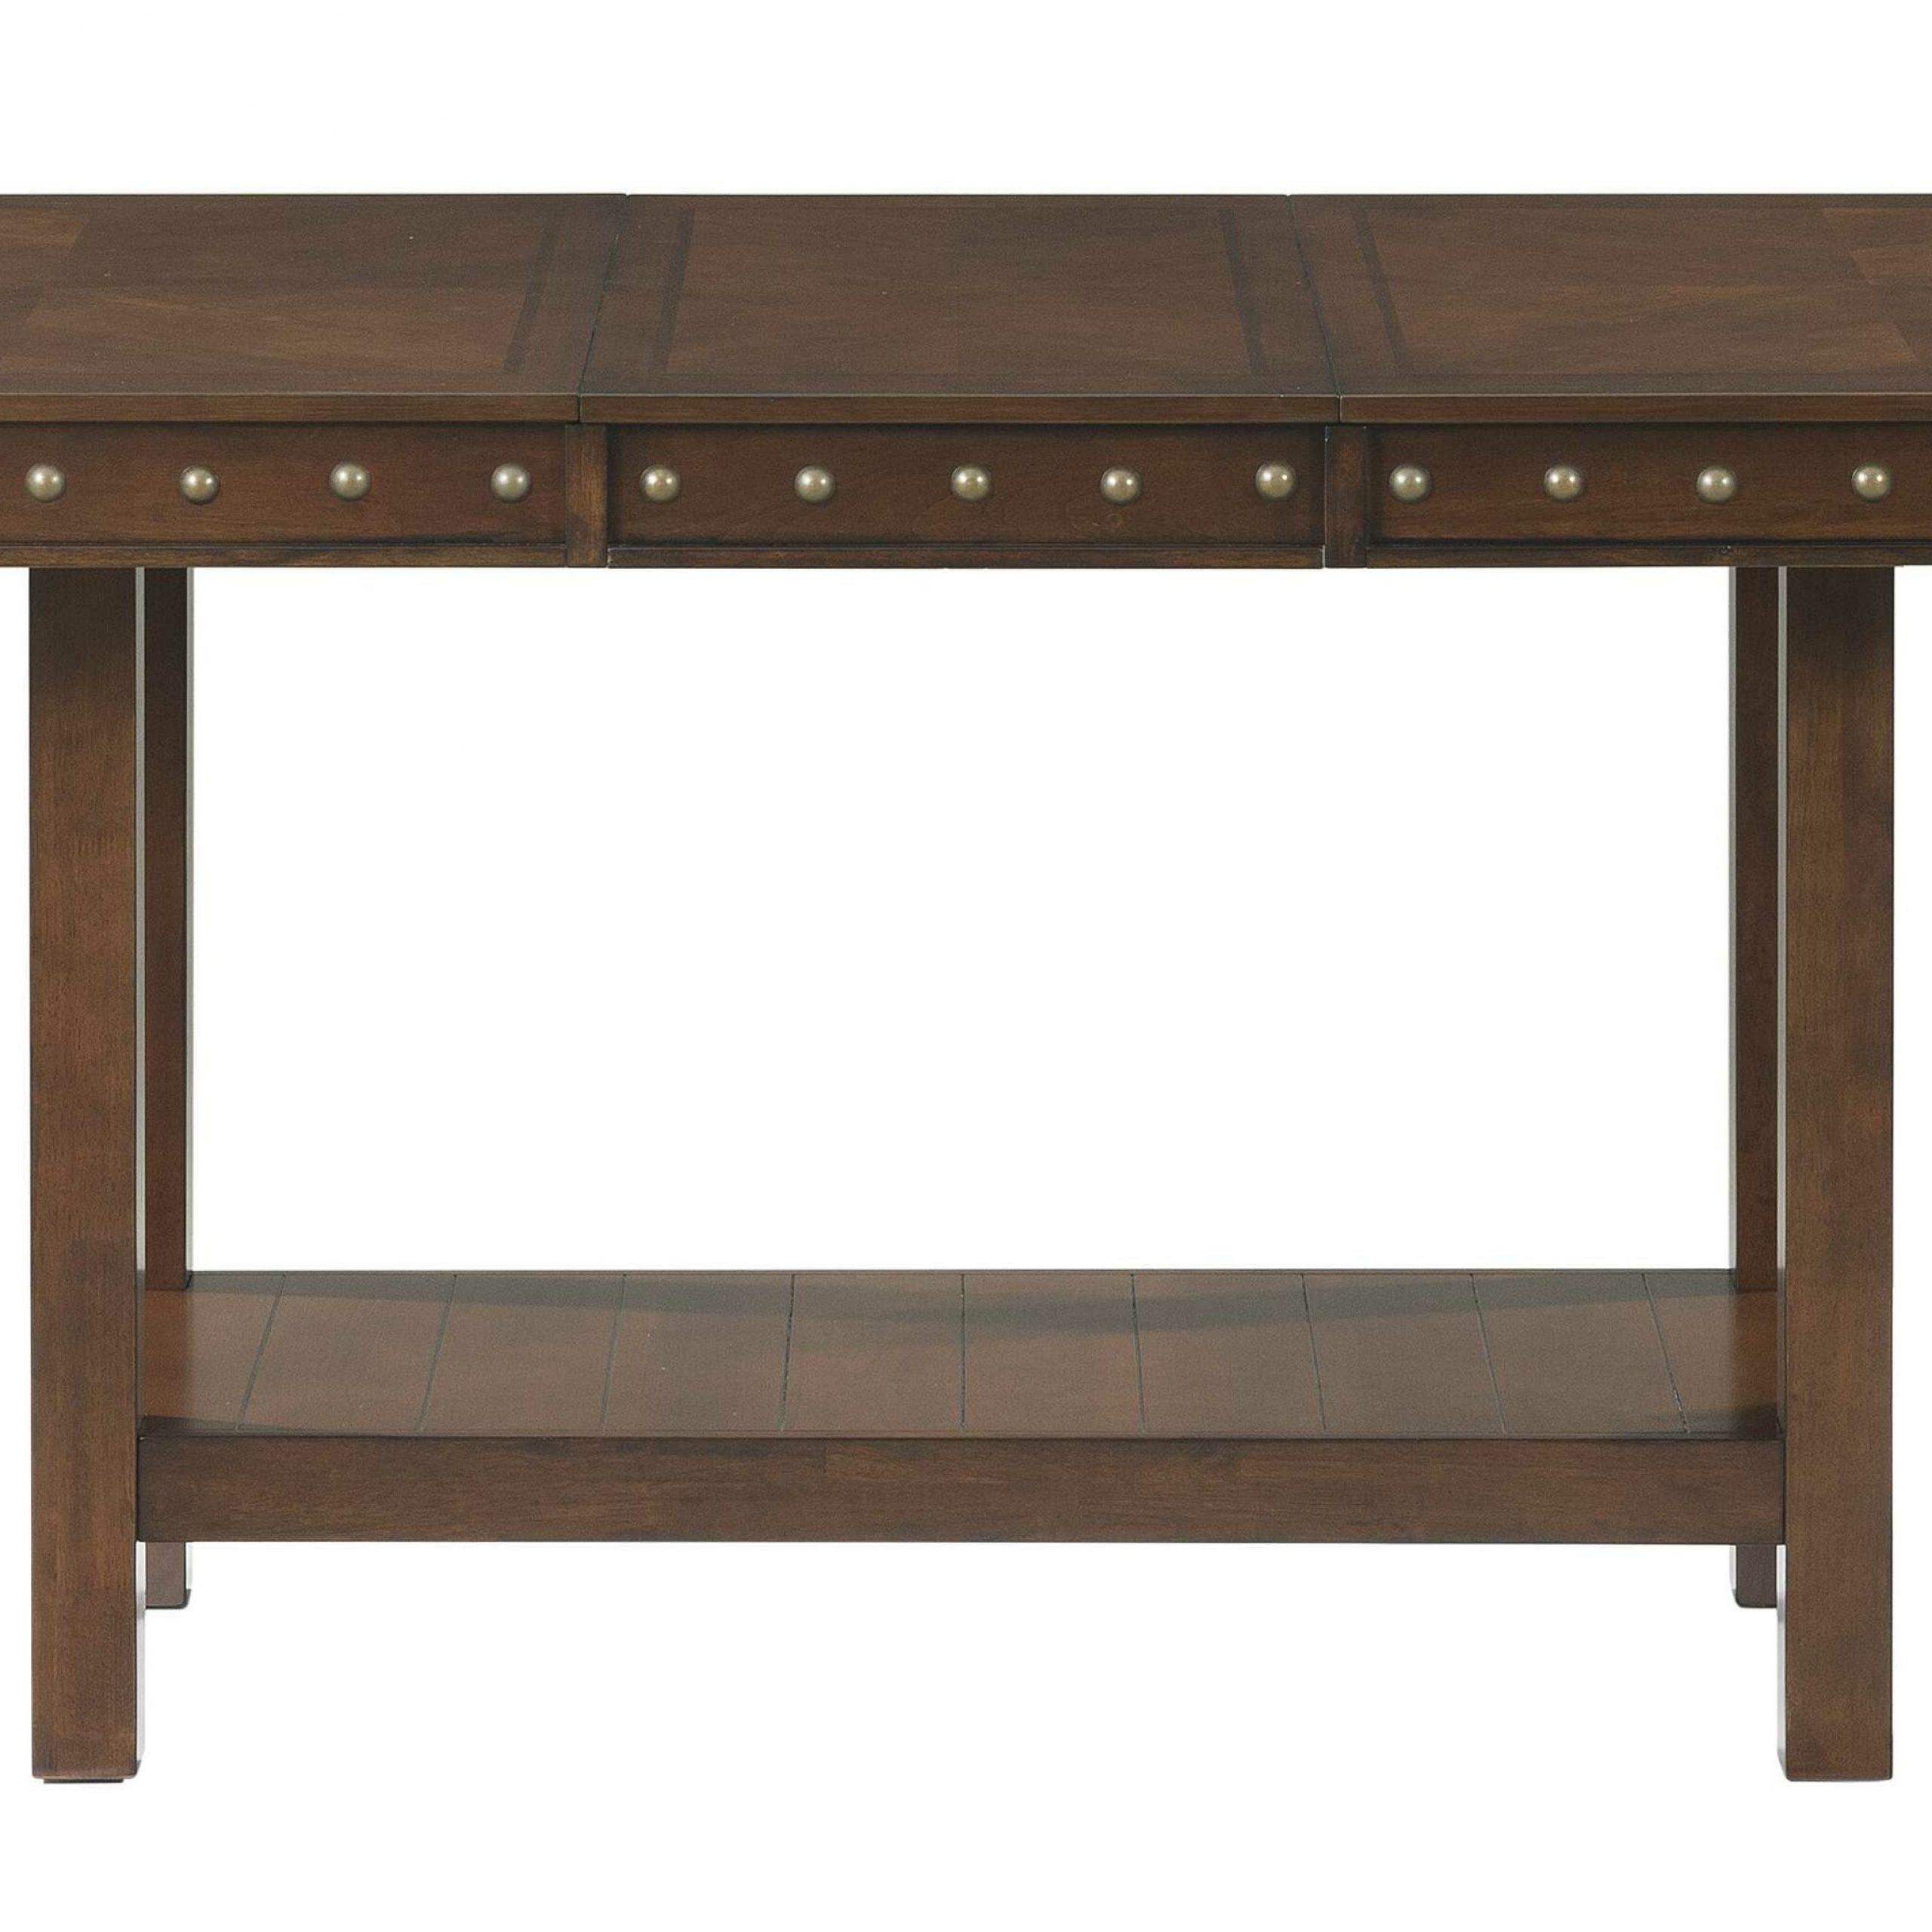 2020 Owen Extendable Dining Table regarding Weathered Gray Owen Pedestal Extending Dining Tables